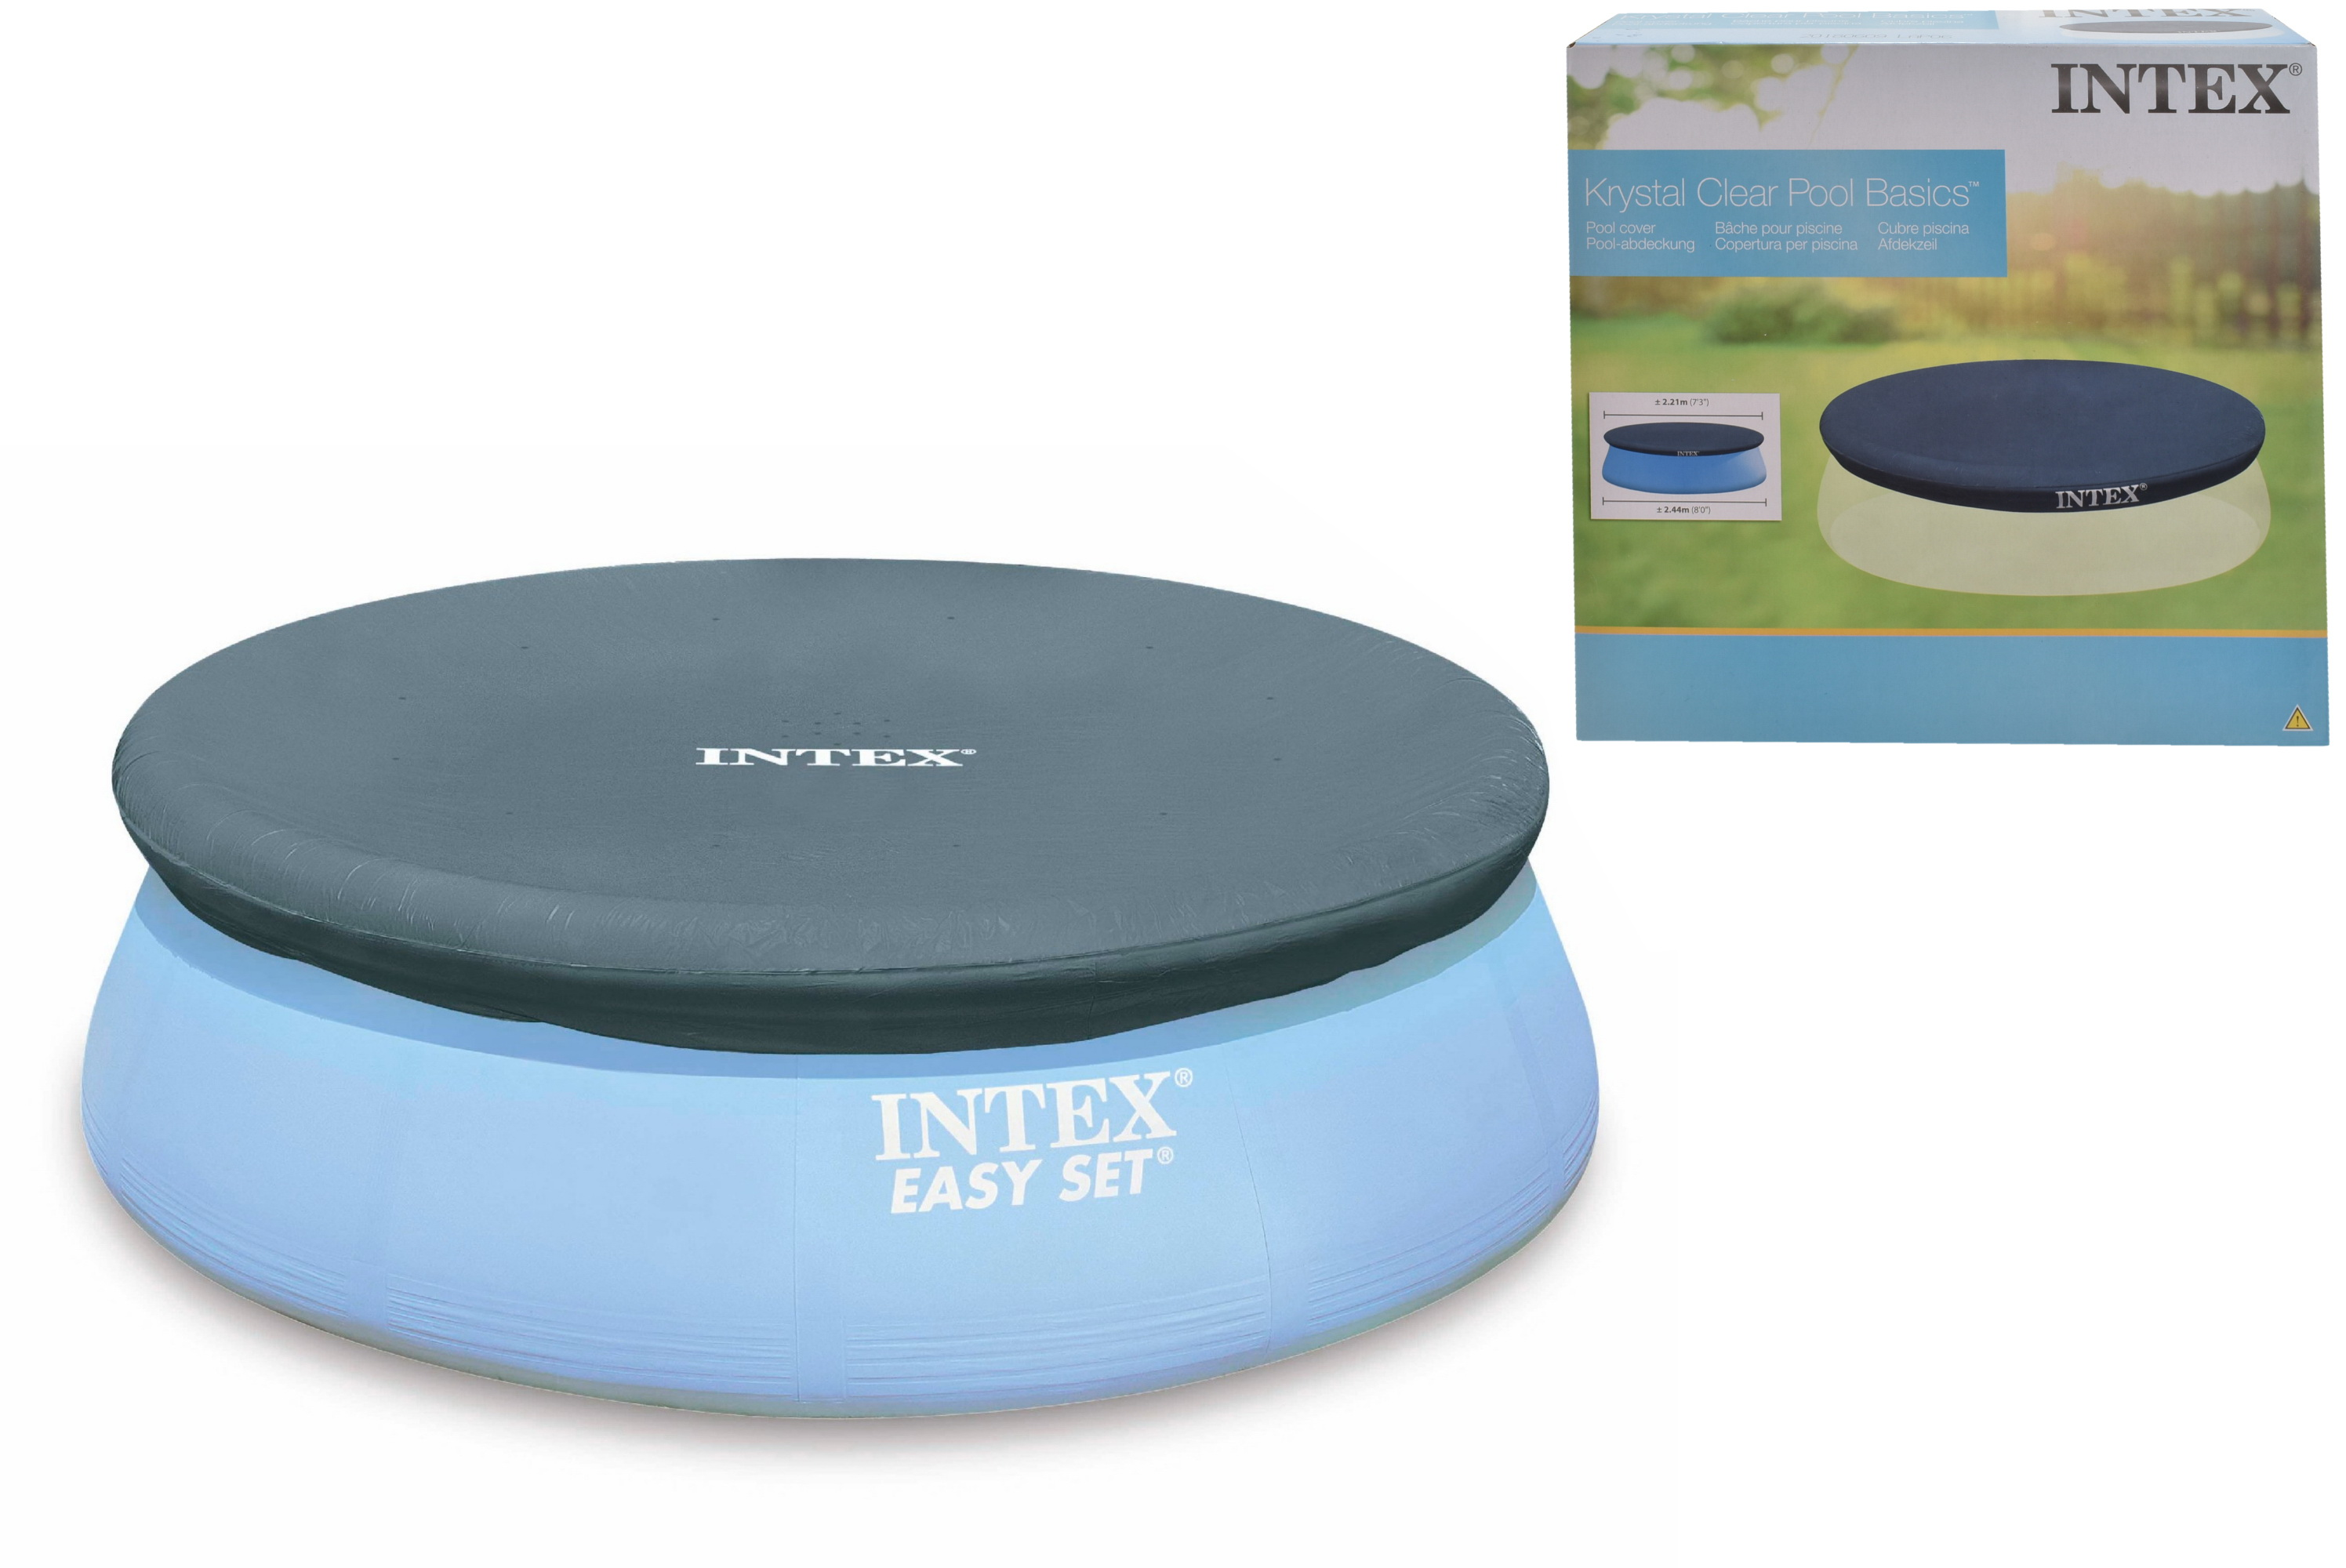 8' Easy Set Pool Cover In Shelf Box